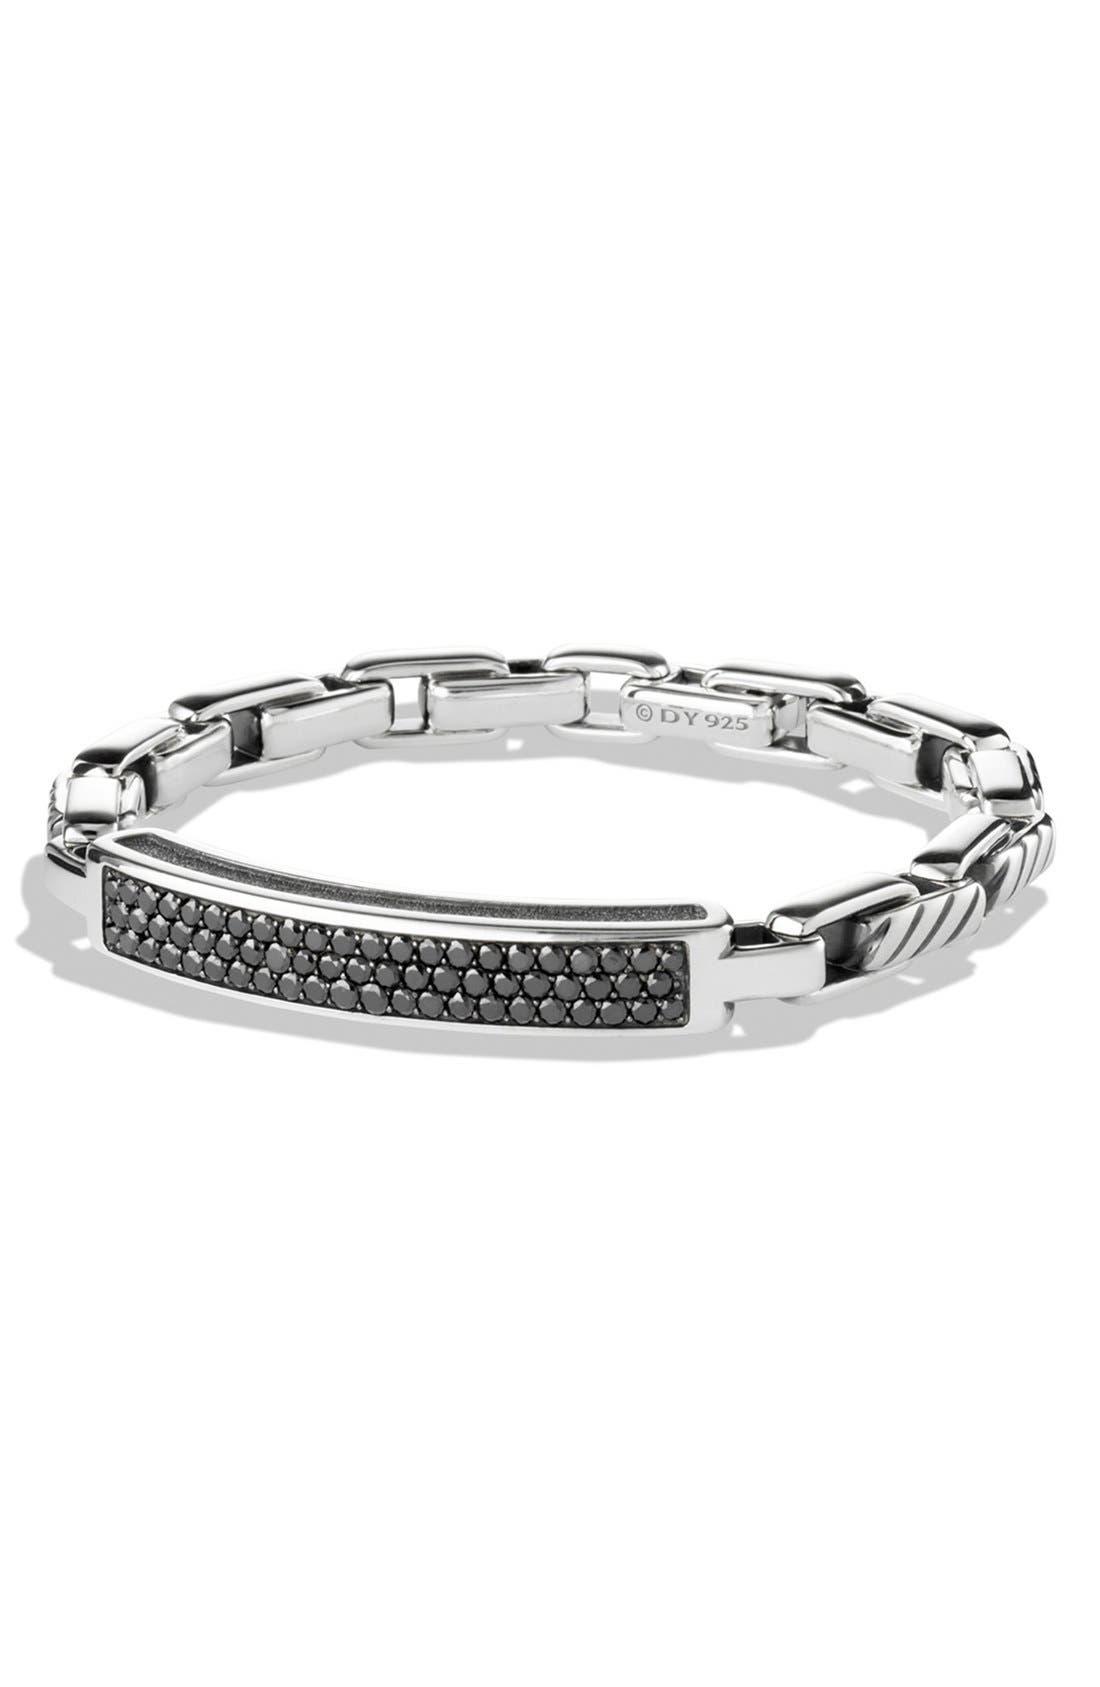 Alternate Image 1 Selected - David Yurman 'Modern Cable' ID Bracelet with Black Diamonds